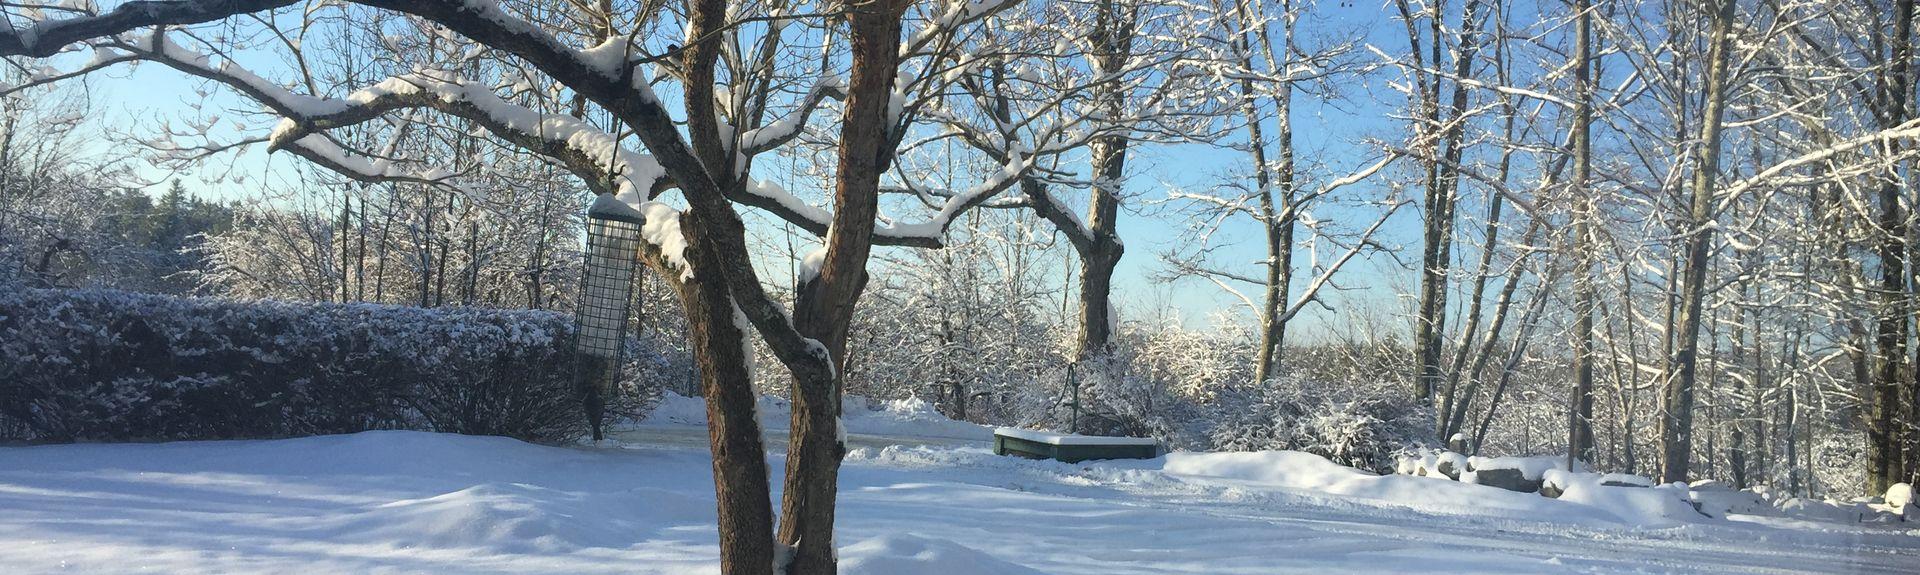 Wilton, New Hampshire, United States of America